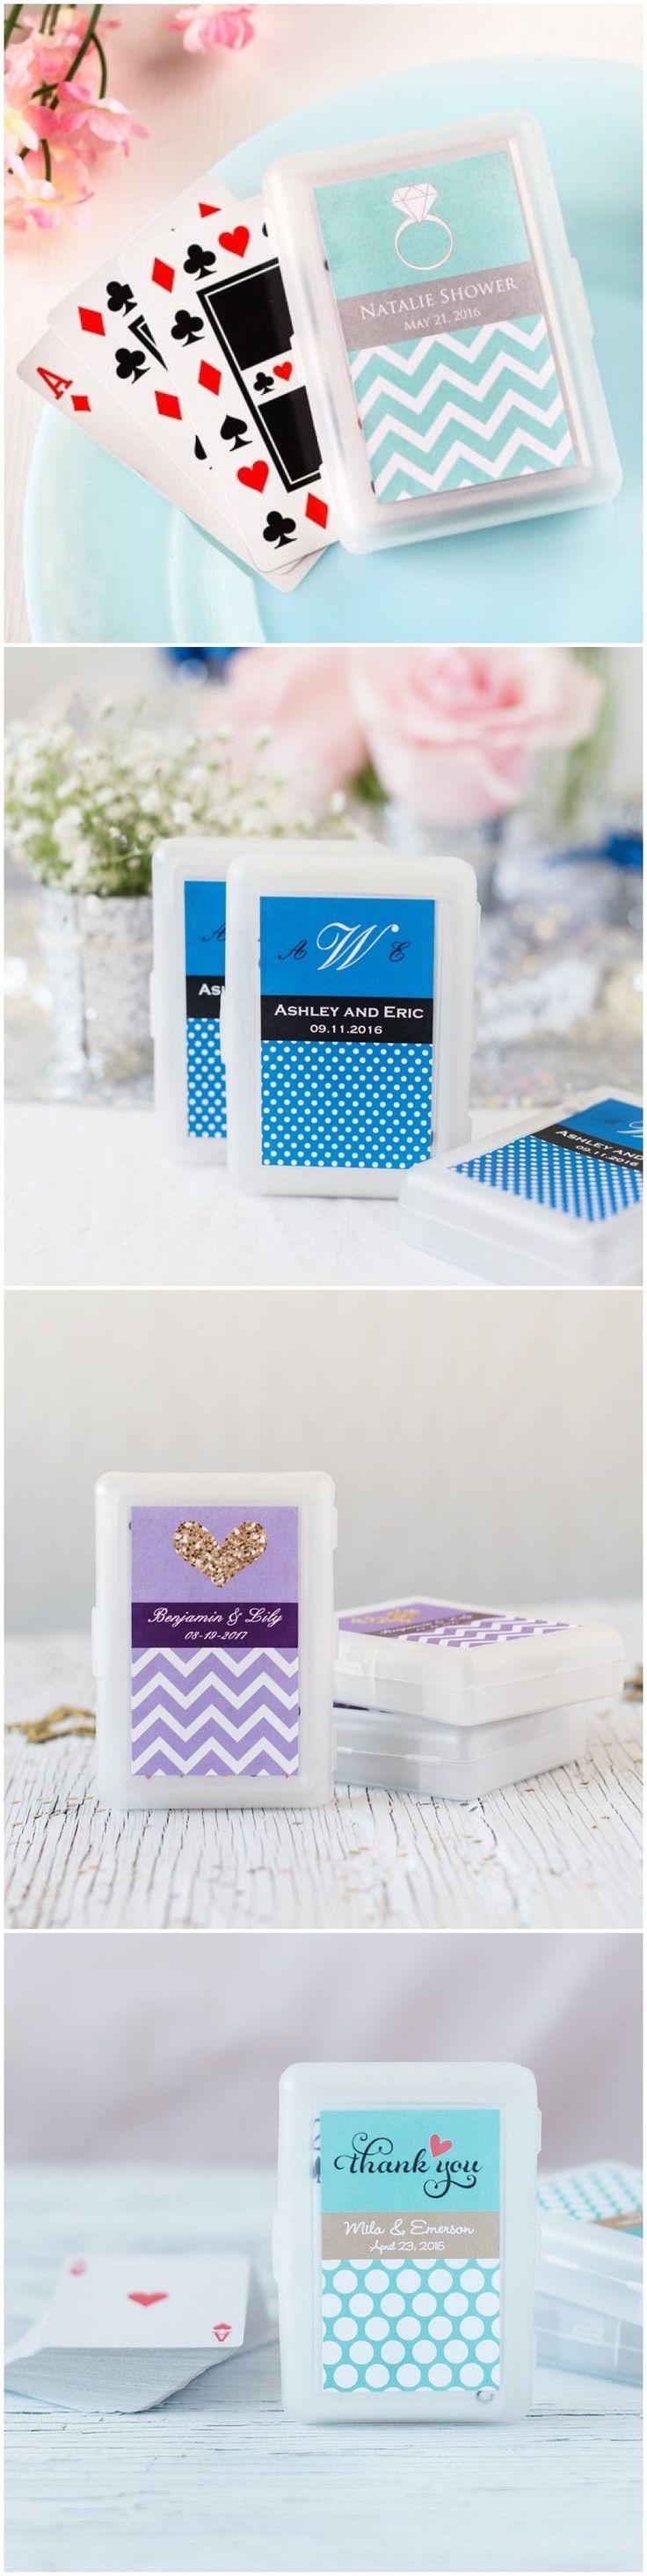 440 best Unique Wedding Favors images on Pinterest | Bridal gifts ...